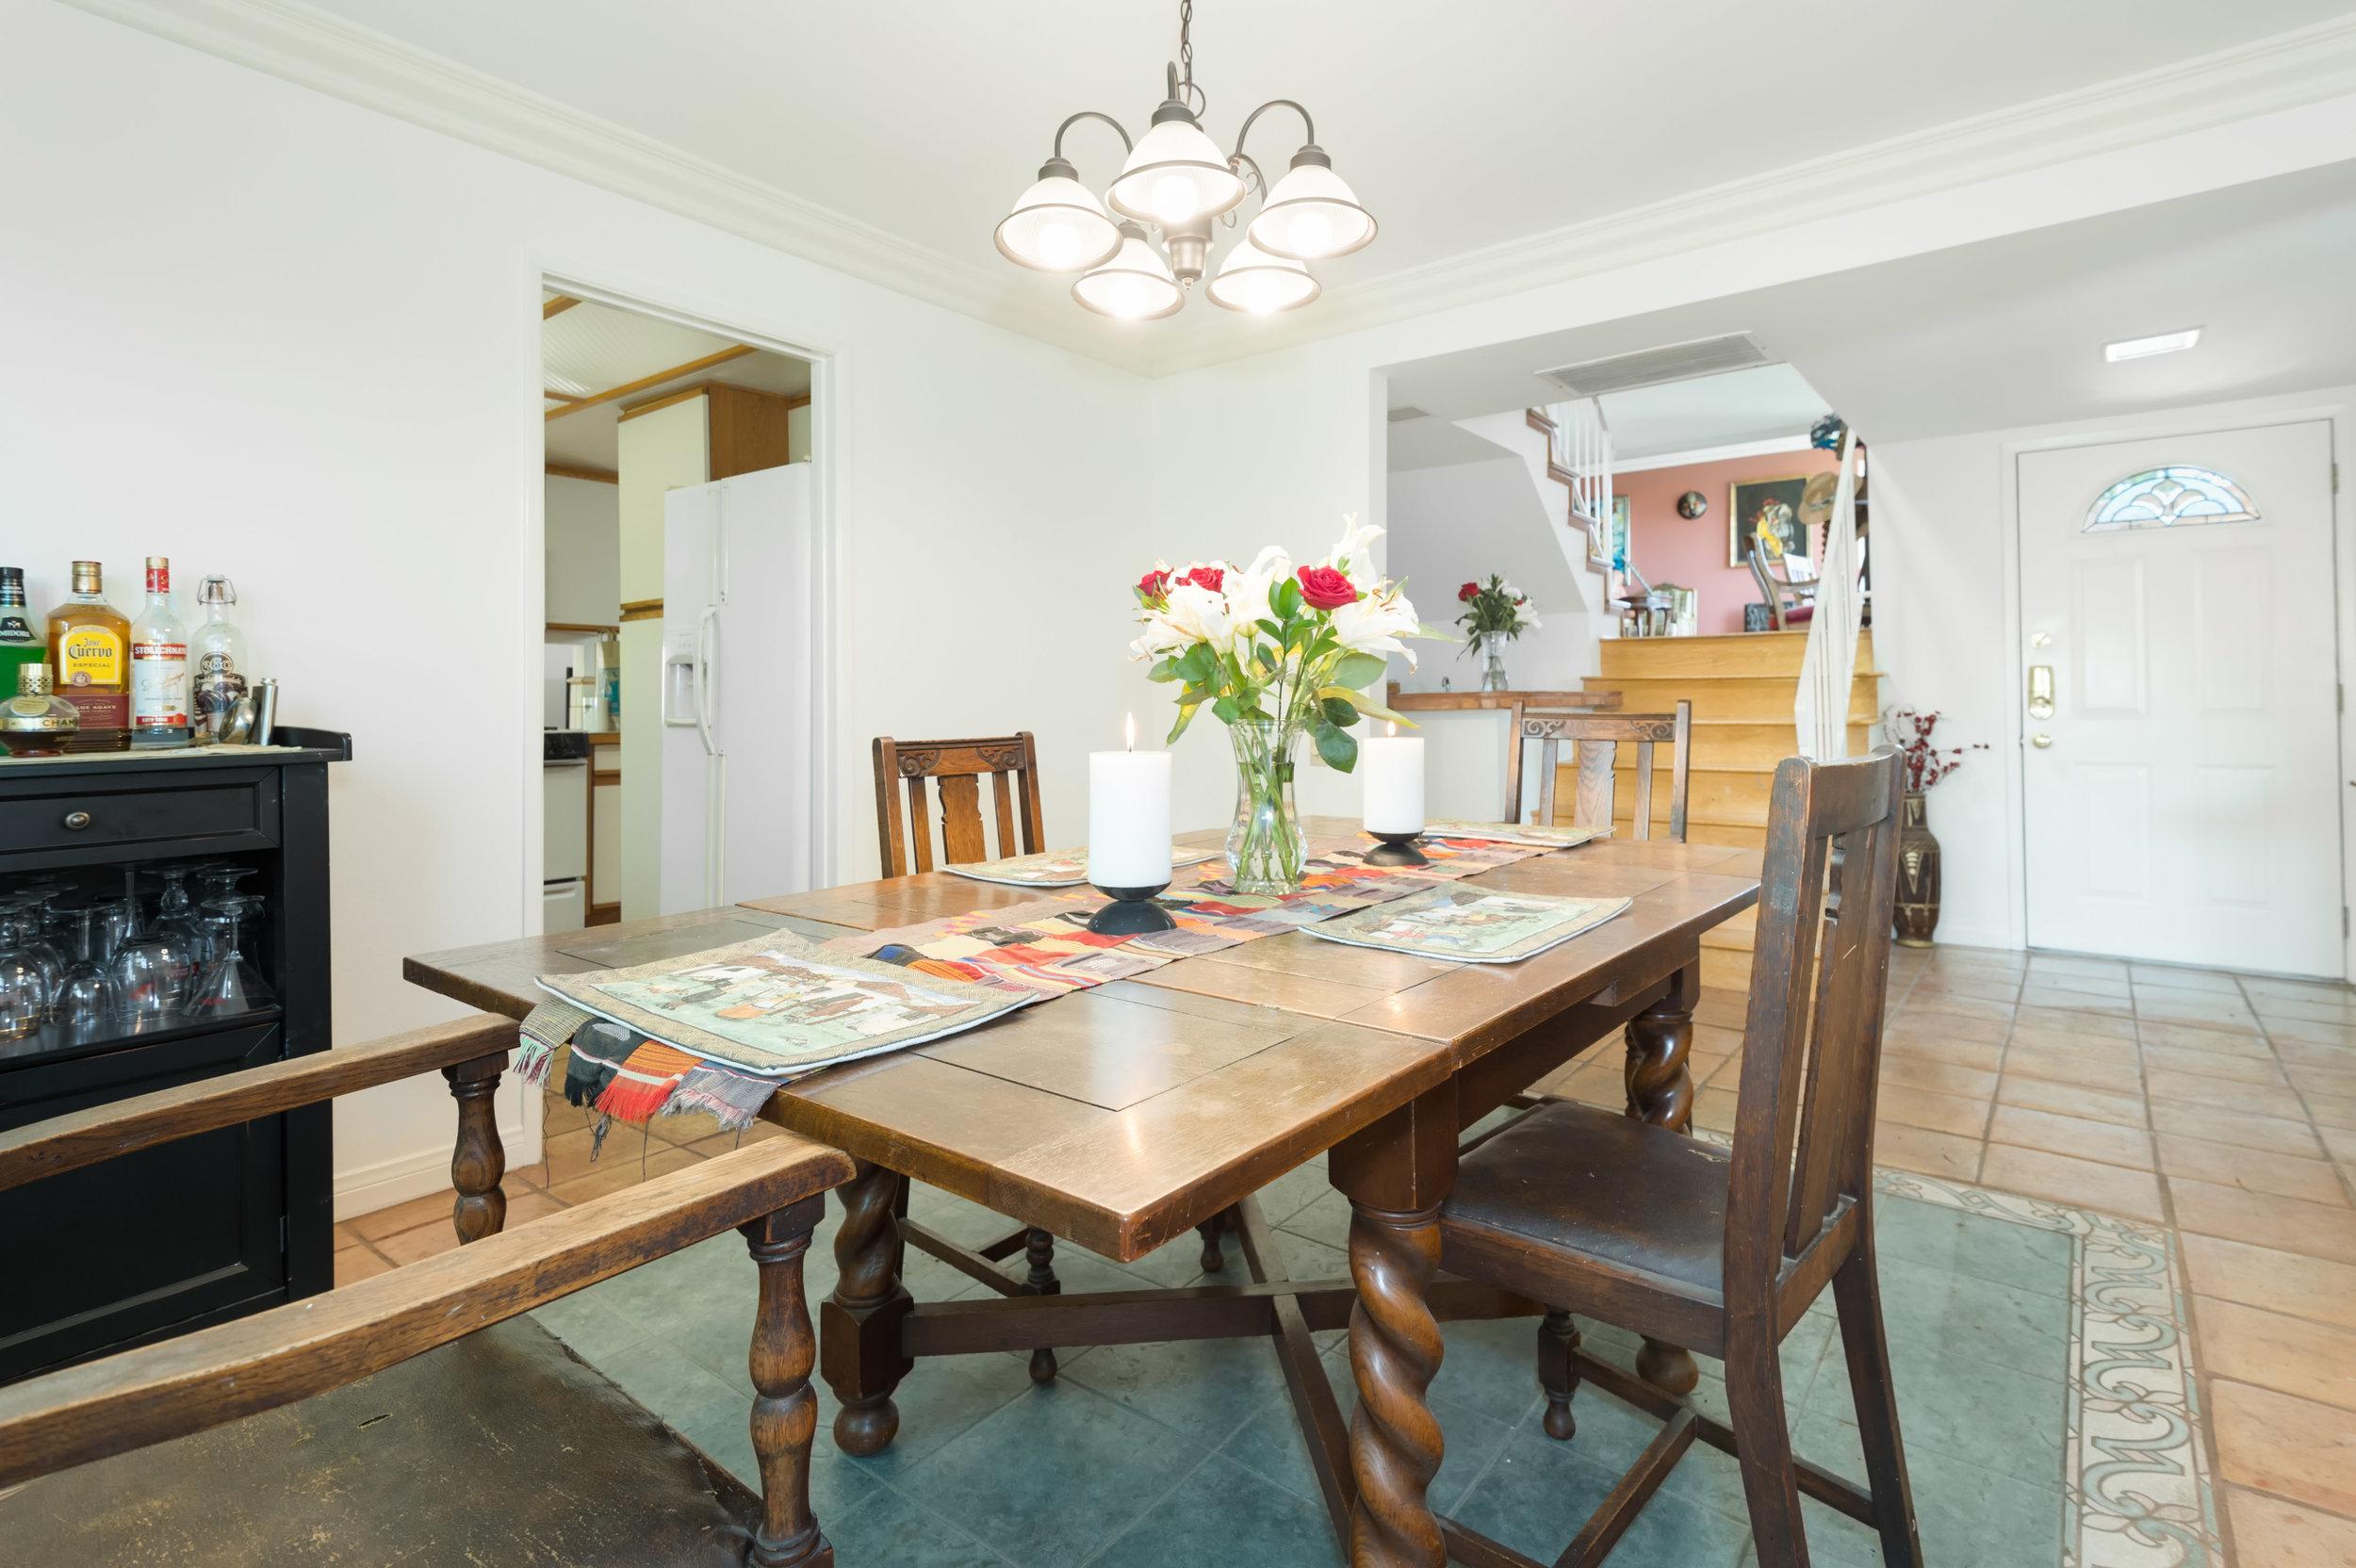 006 Kitchen 15072 Rayneta Sherman Oaks For Sale The Malibu Life Team Luxury Real Estate.jpg